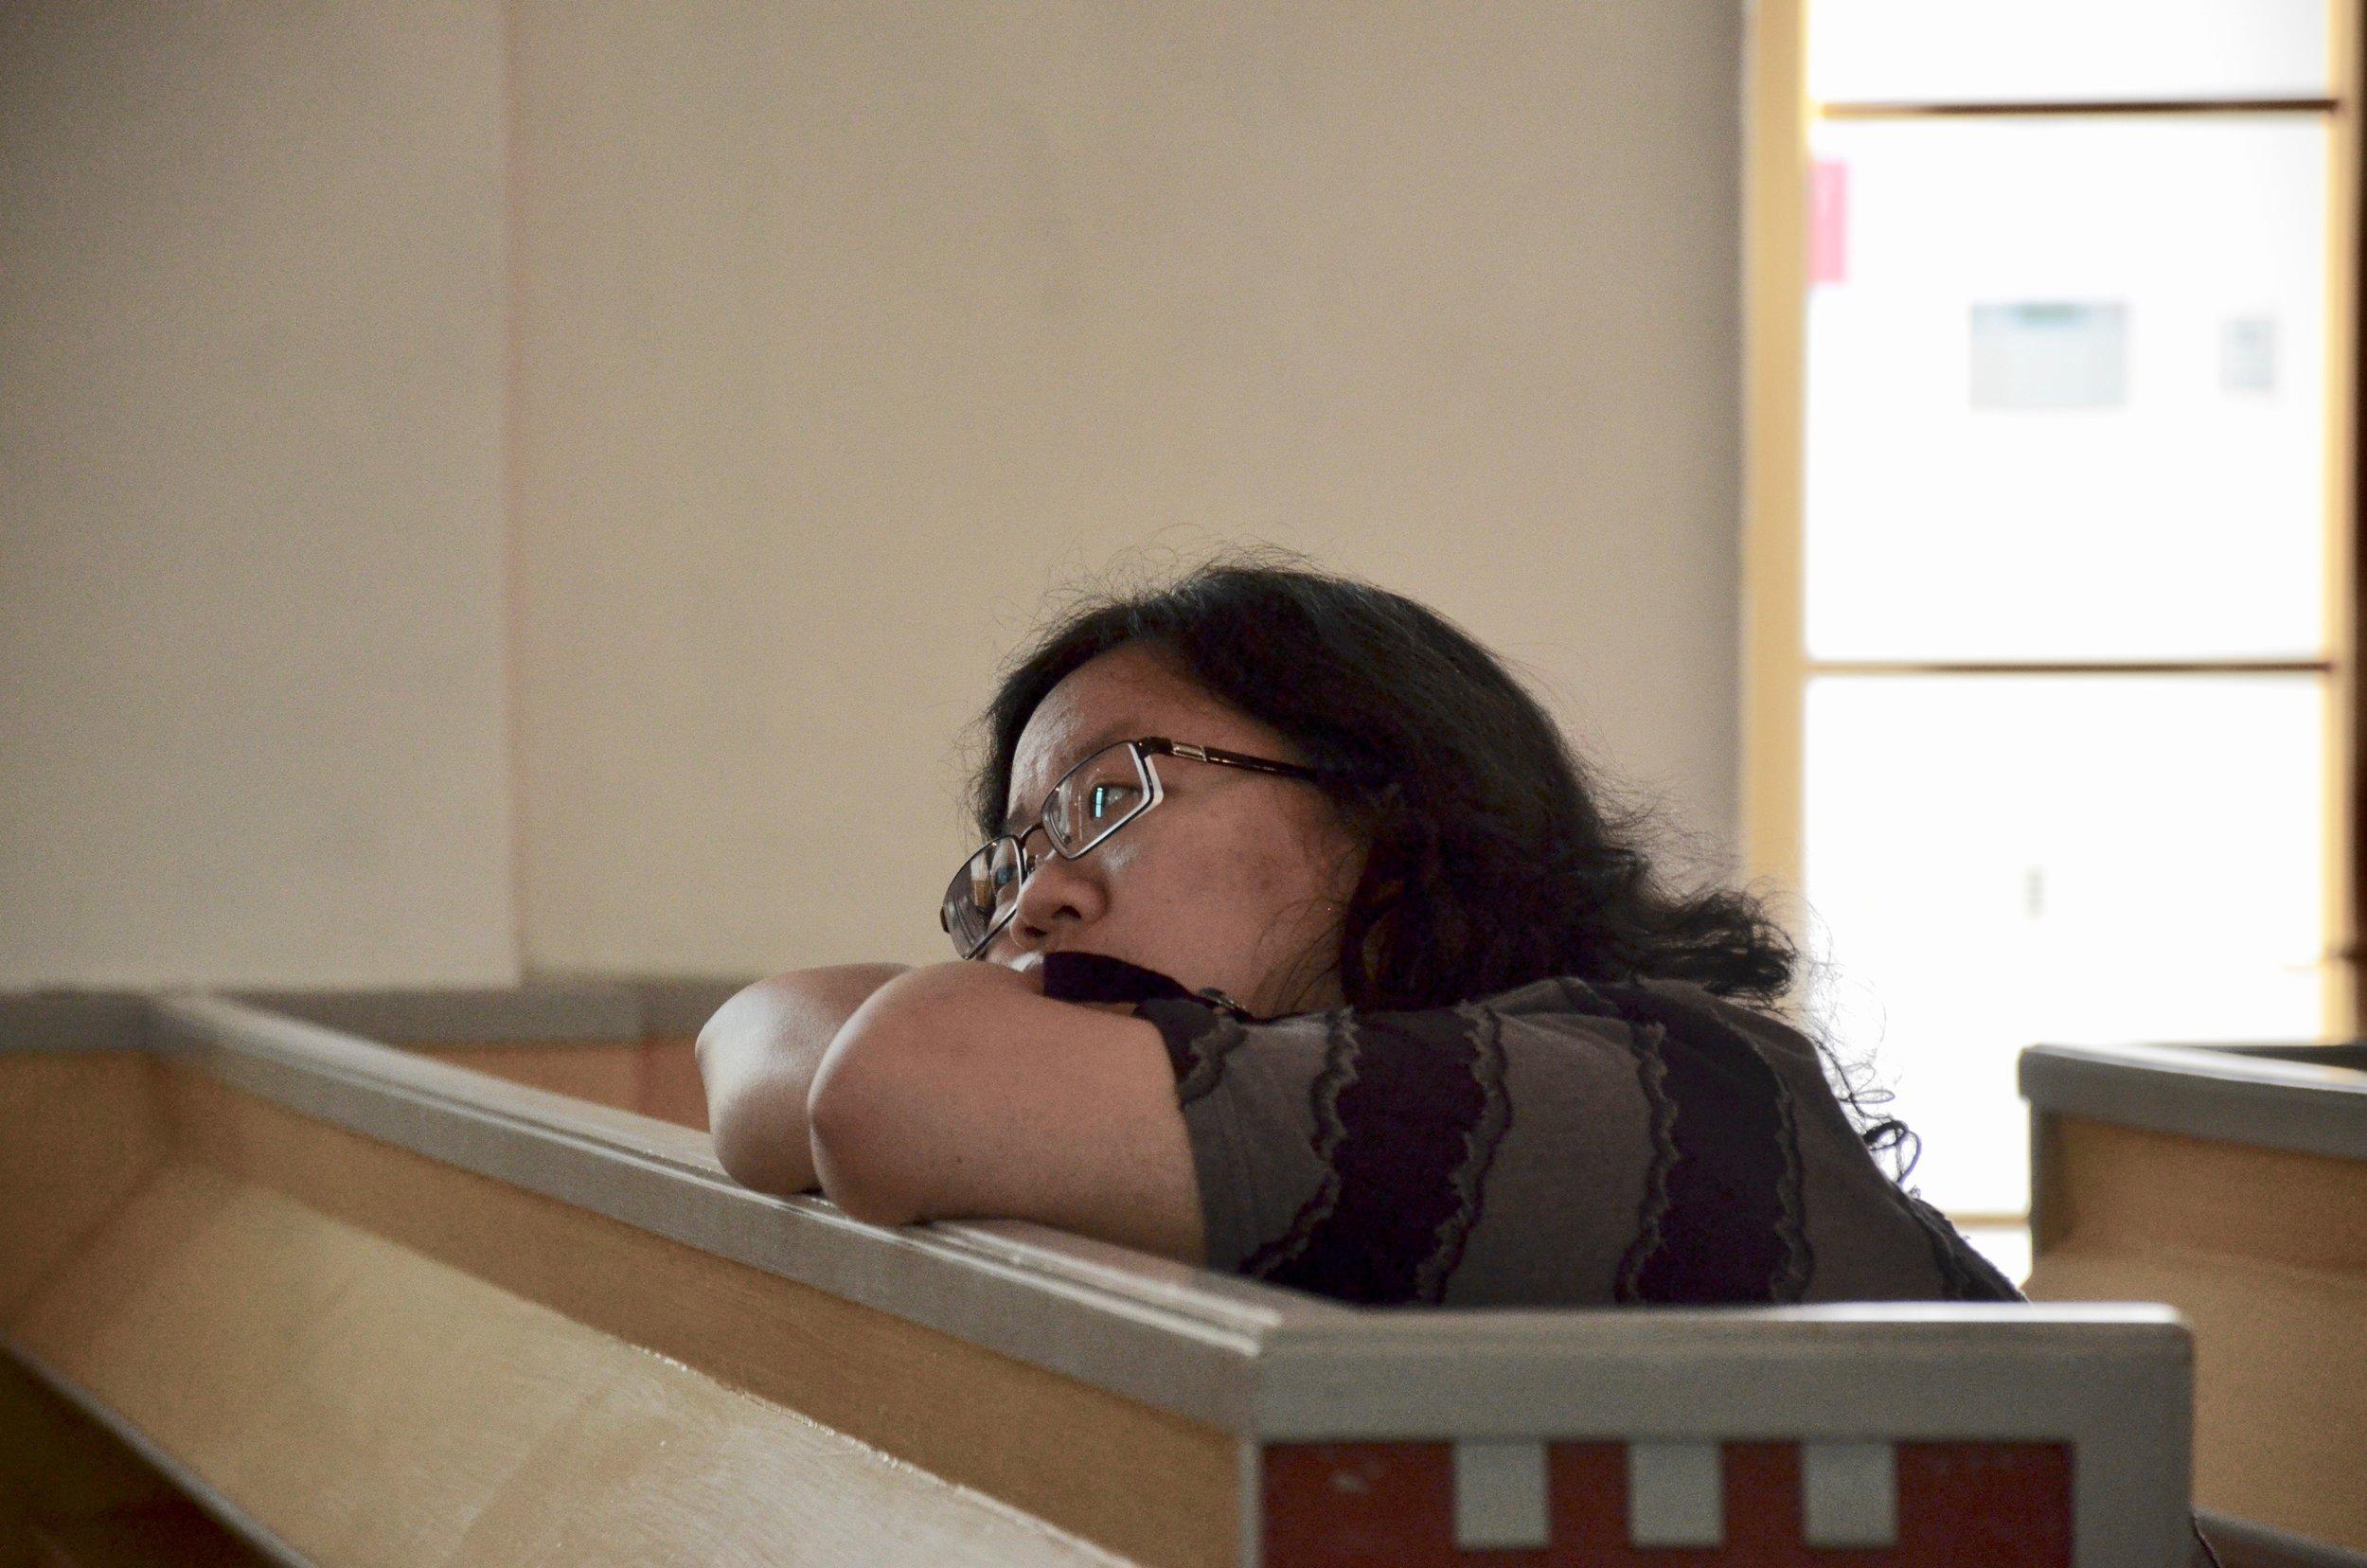 Jennifer Hsiao listens to the sounds of the 1783 Schiörlin organ in Jonsered, Sweden.